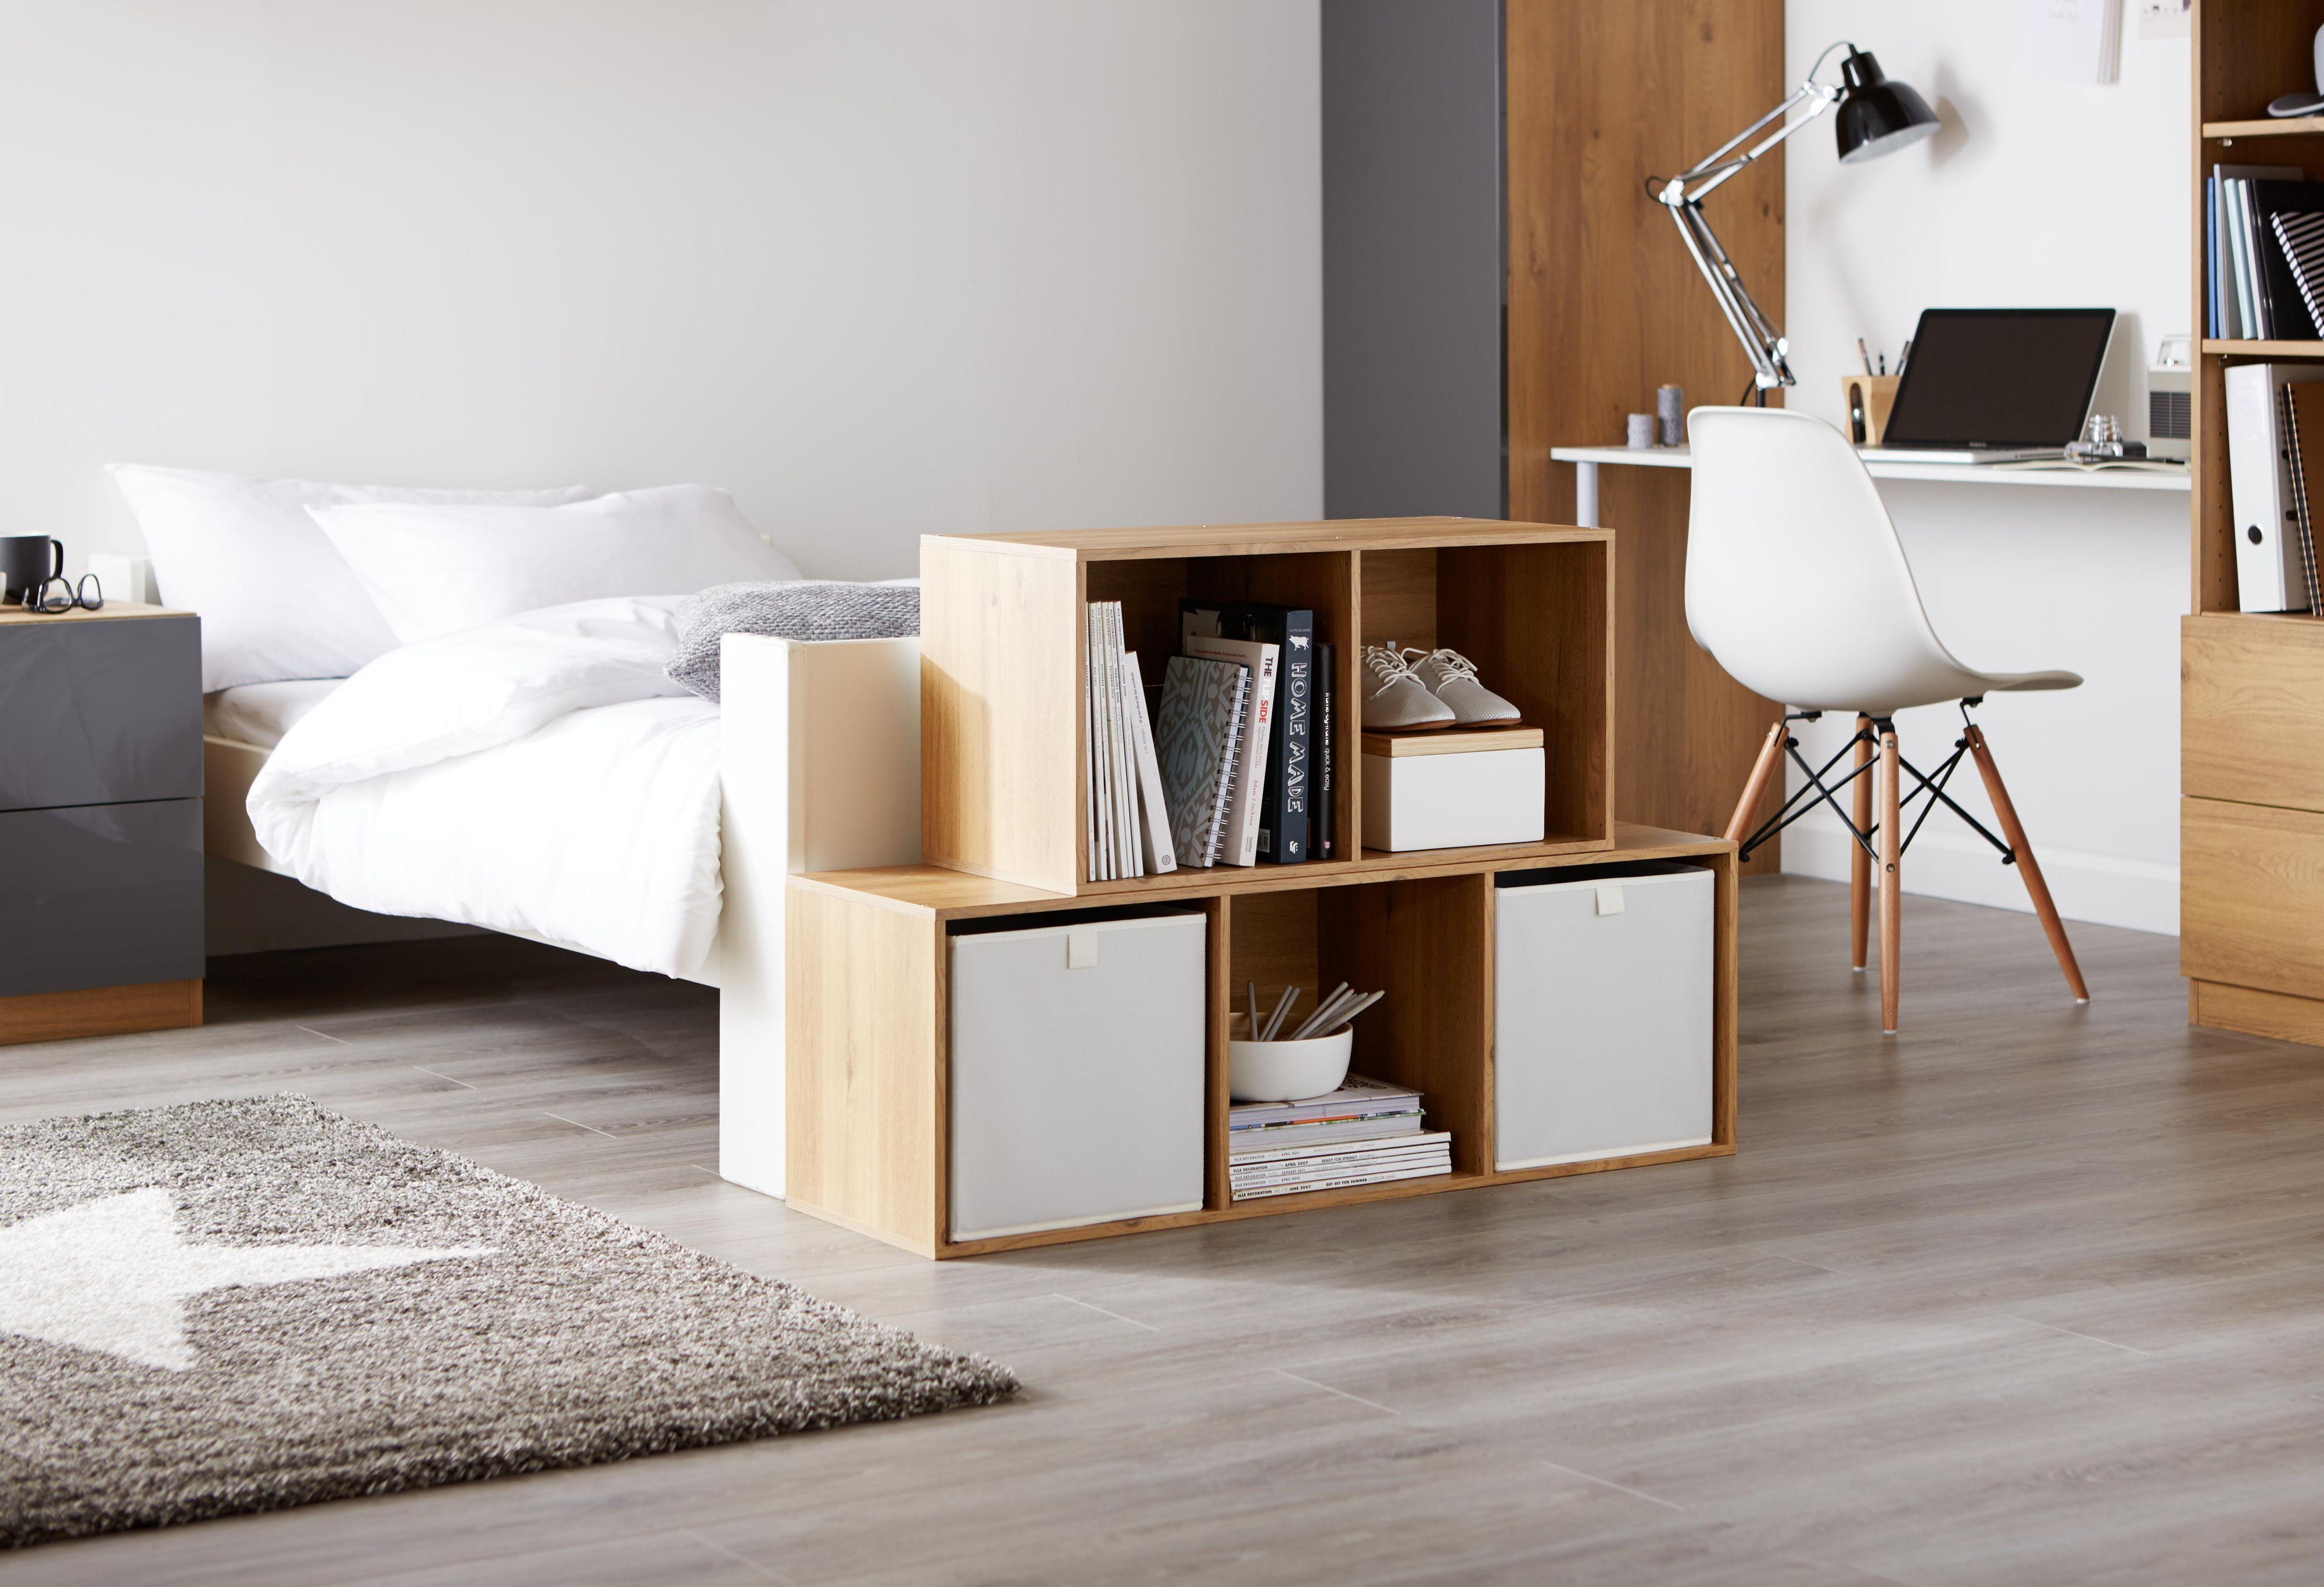 modular furniture cube storage QQWJJBY